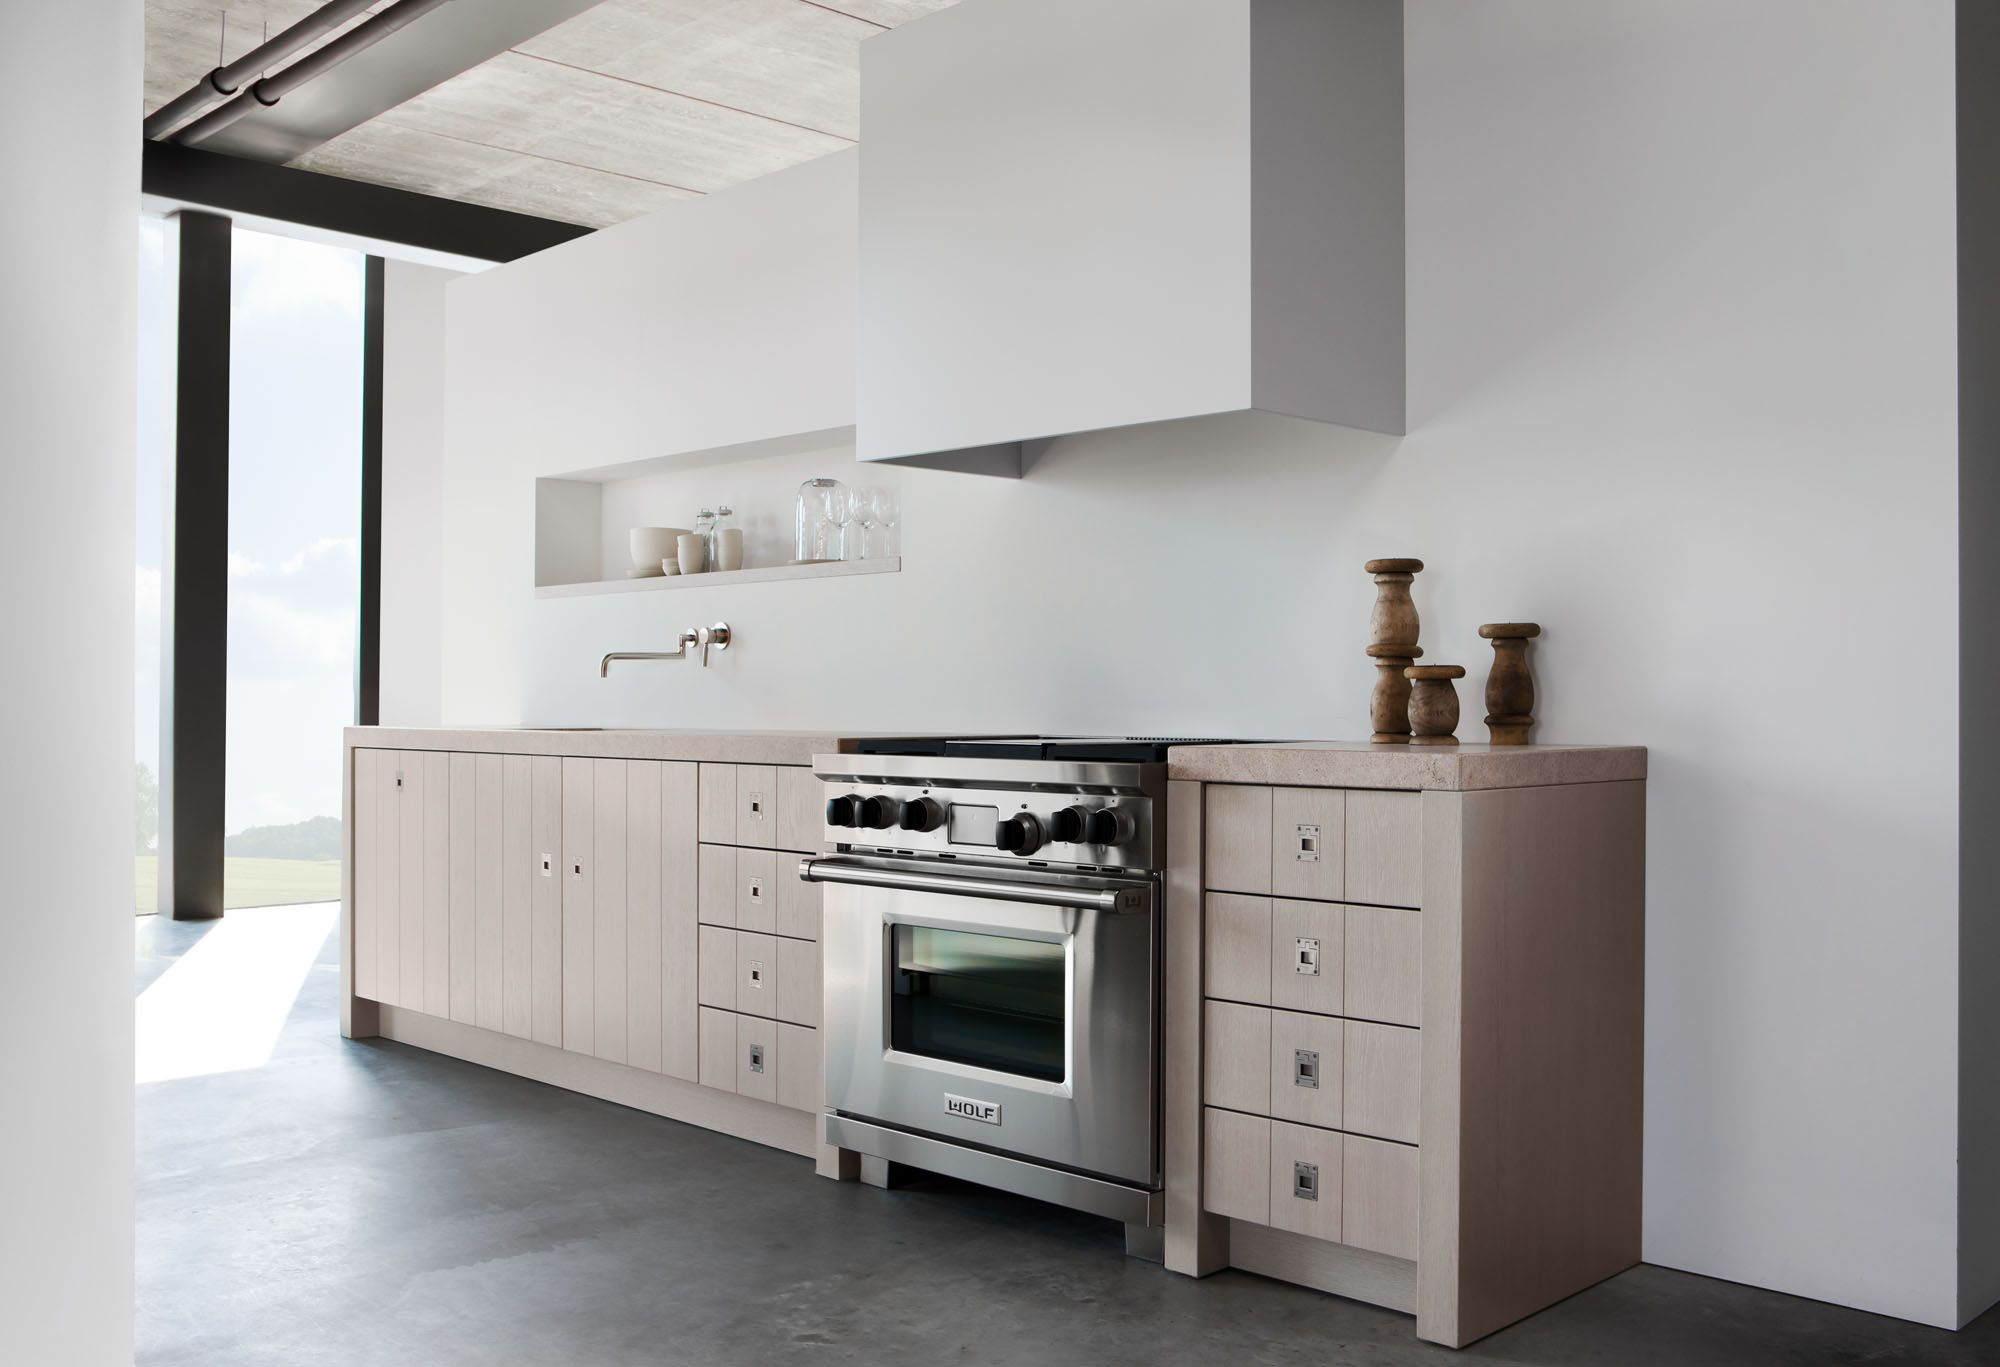 Bekend keuken rechte opstelling meter as belbin